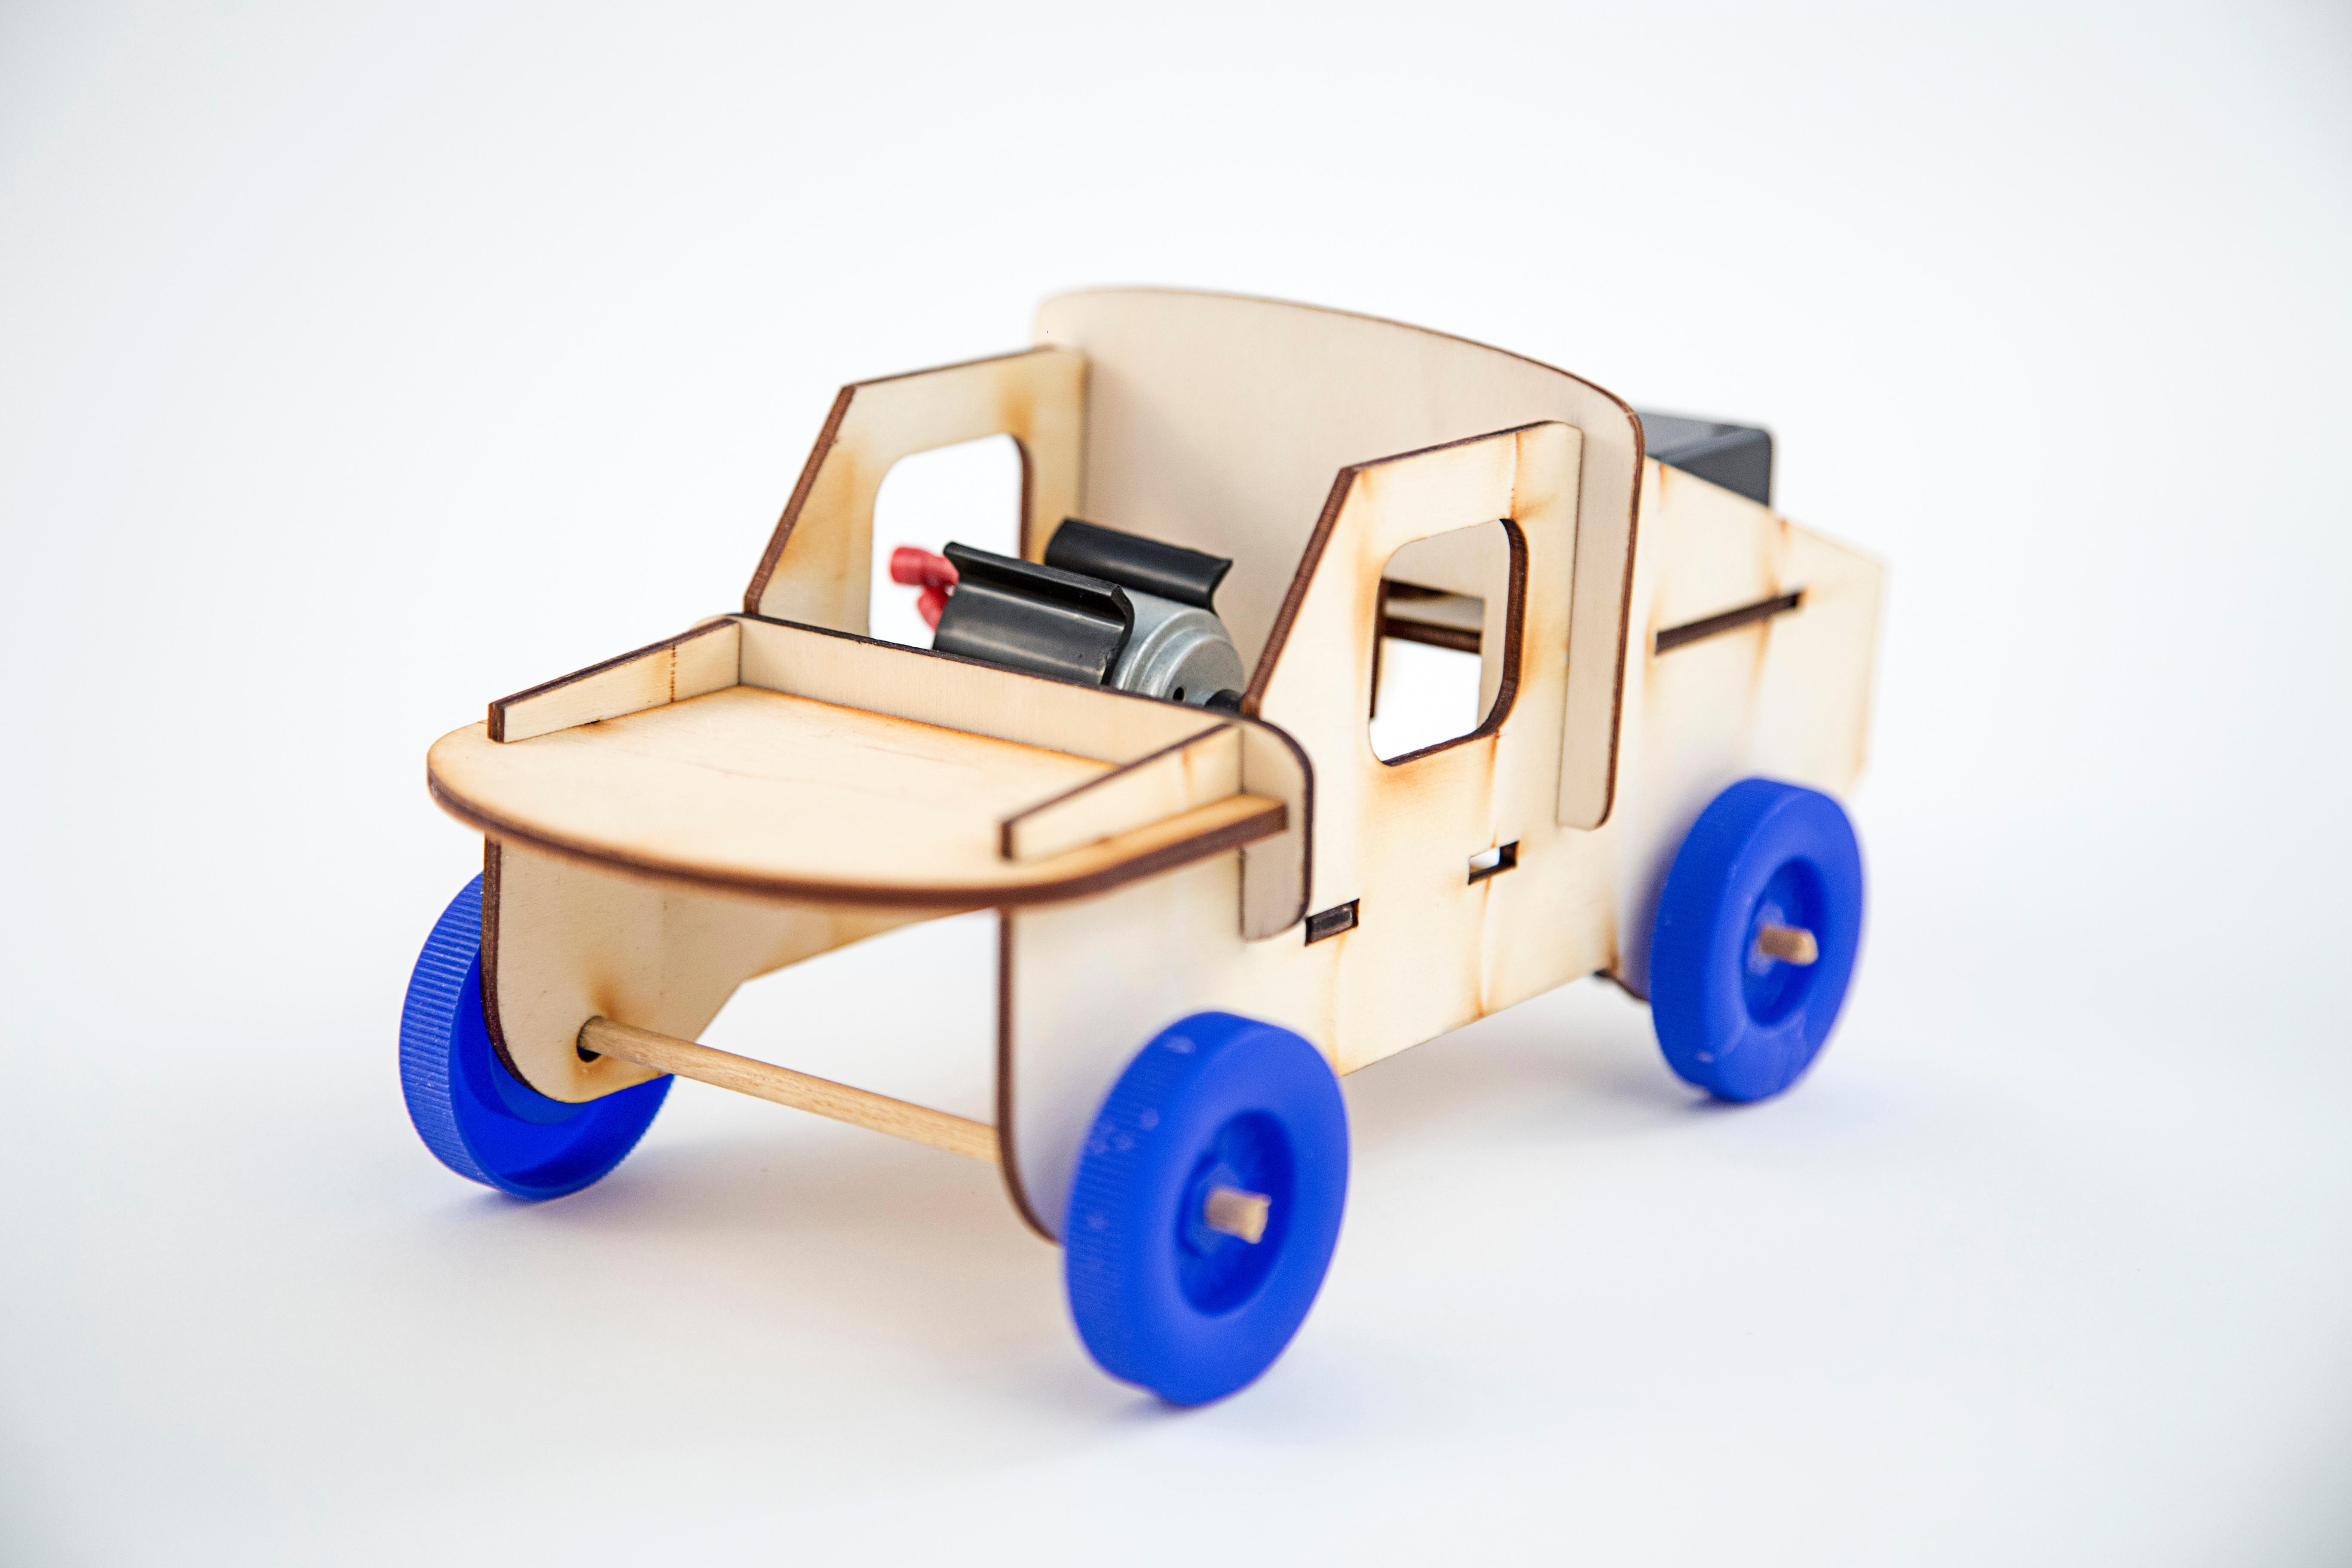 S.T.E.M. Battery-Powered Car